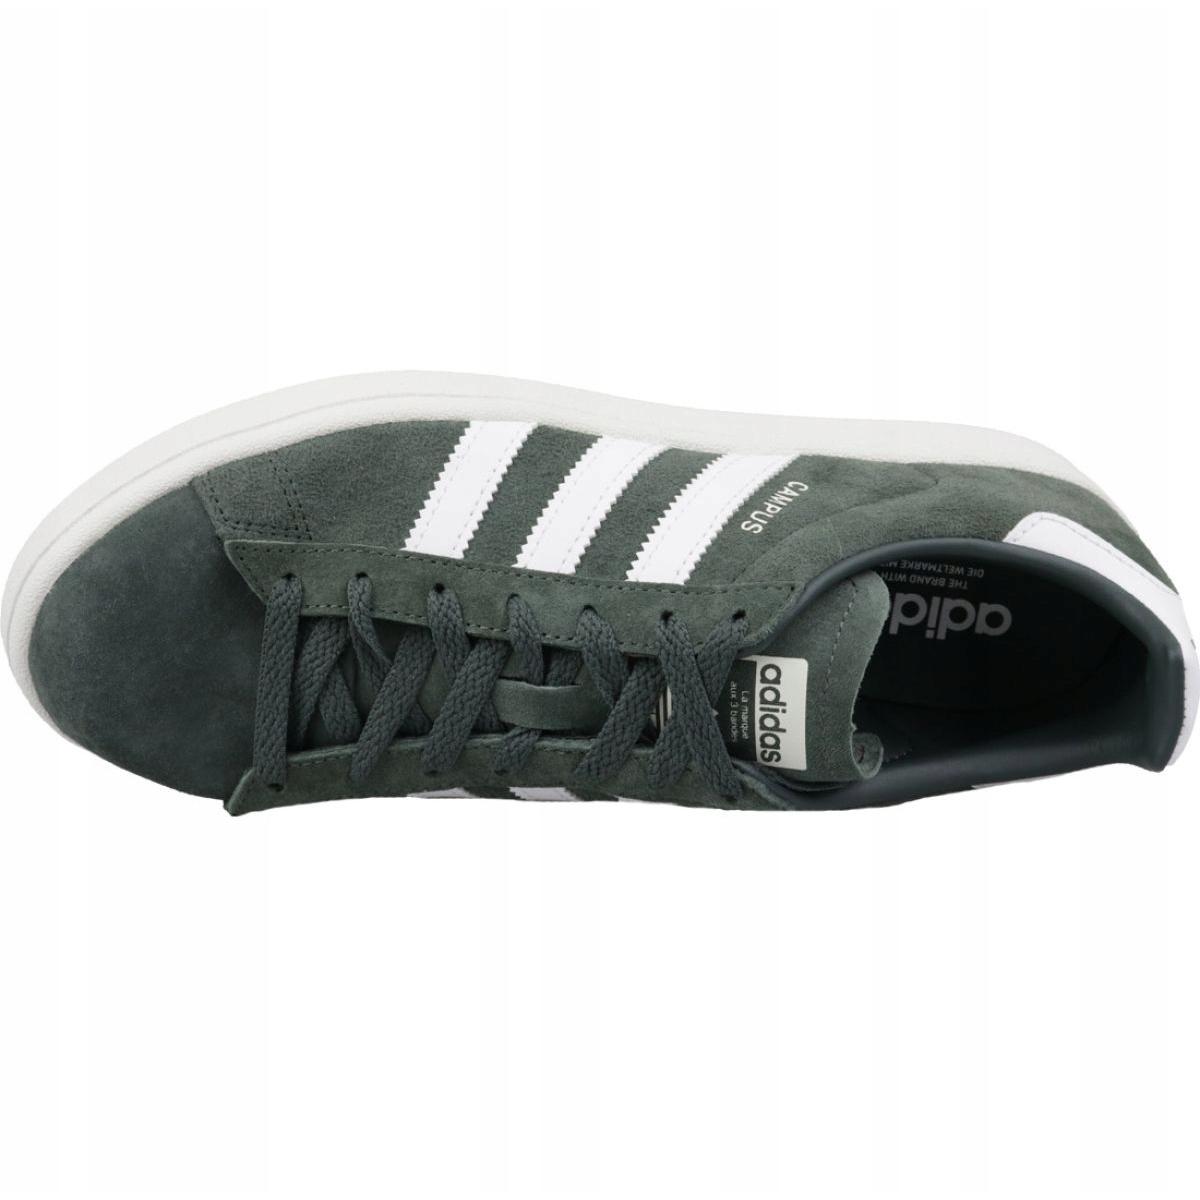 Adidas Campus M CM8445 shoes green